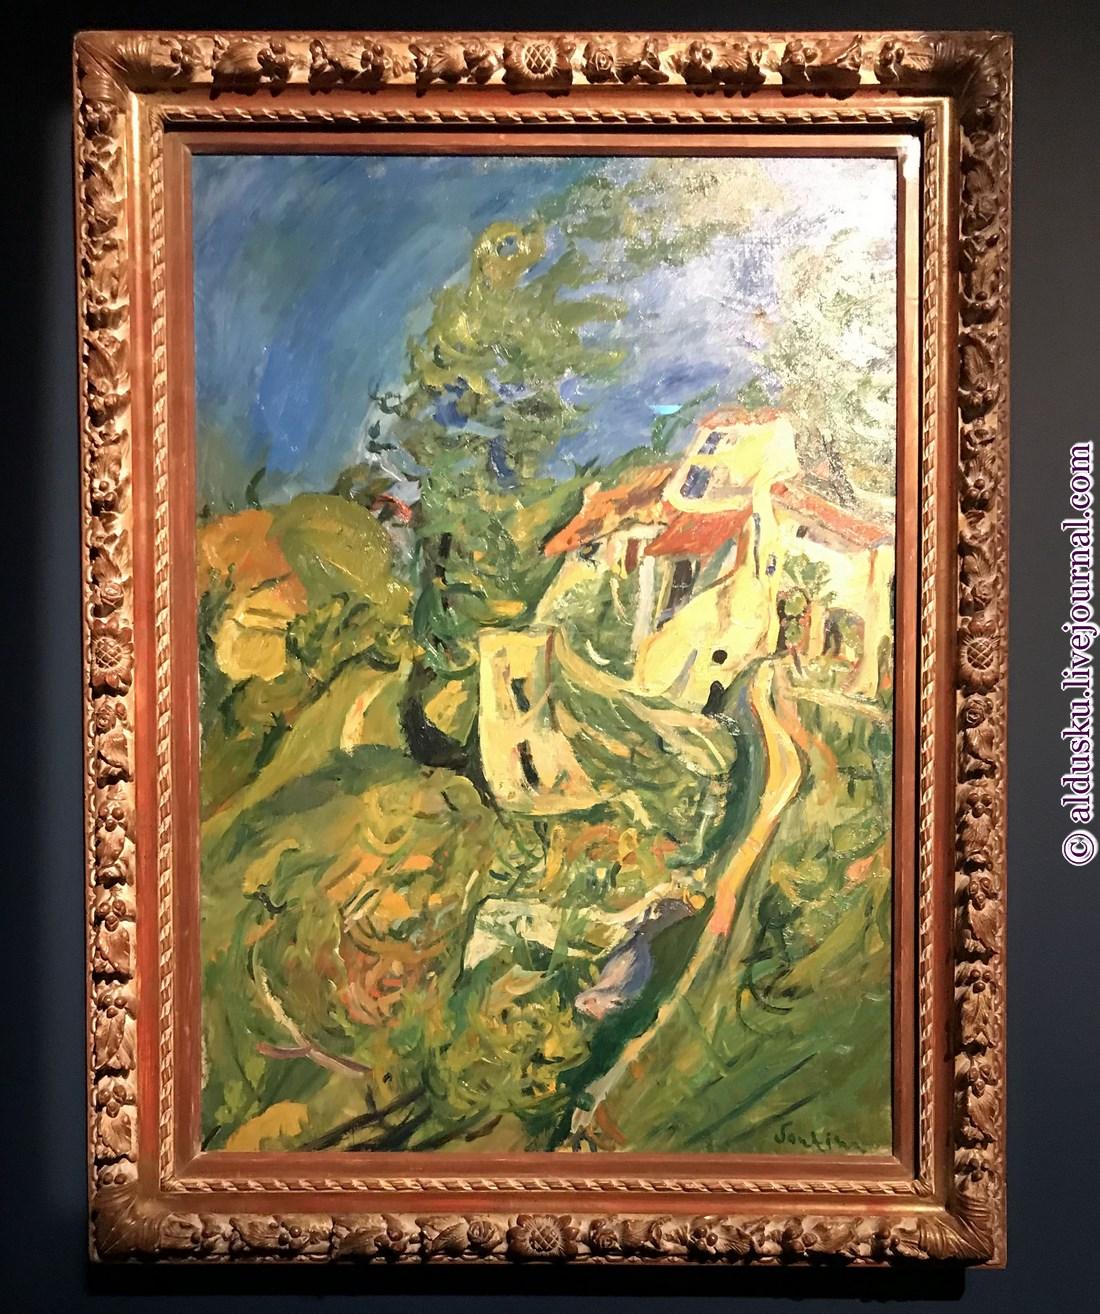 7. Пейзаж. Около 1922-1923. Музей Оранжери.